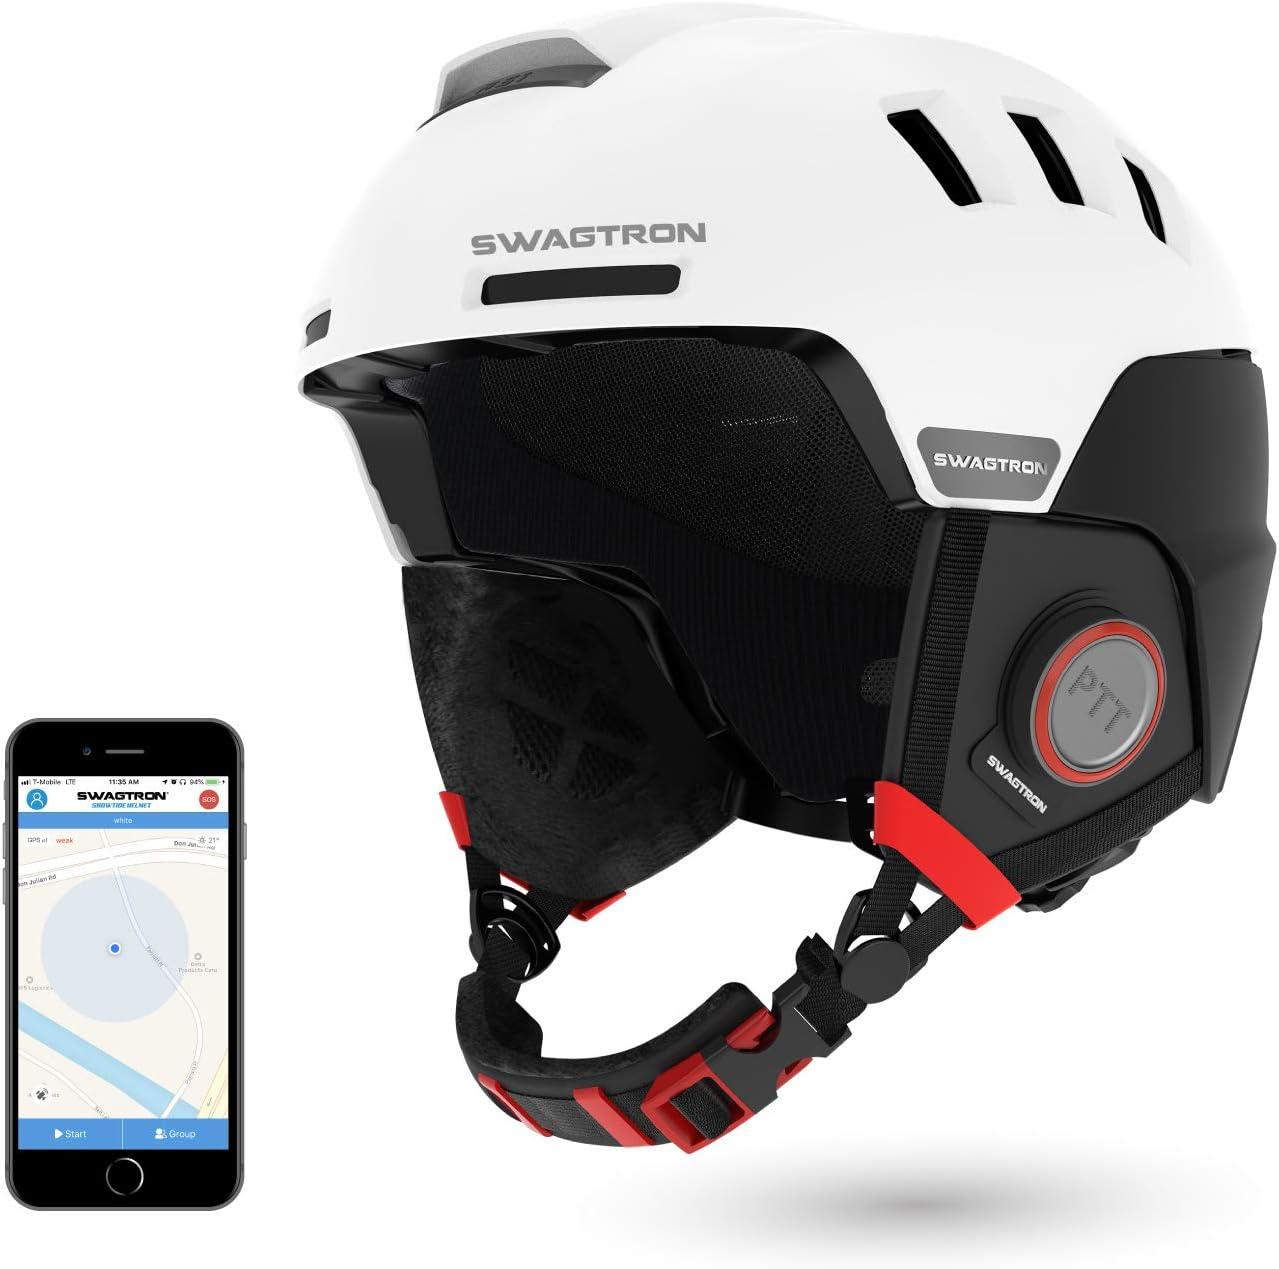 Swagtron Snowtide Ski & Snowboard Helmet